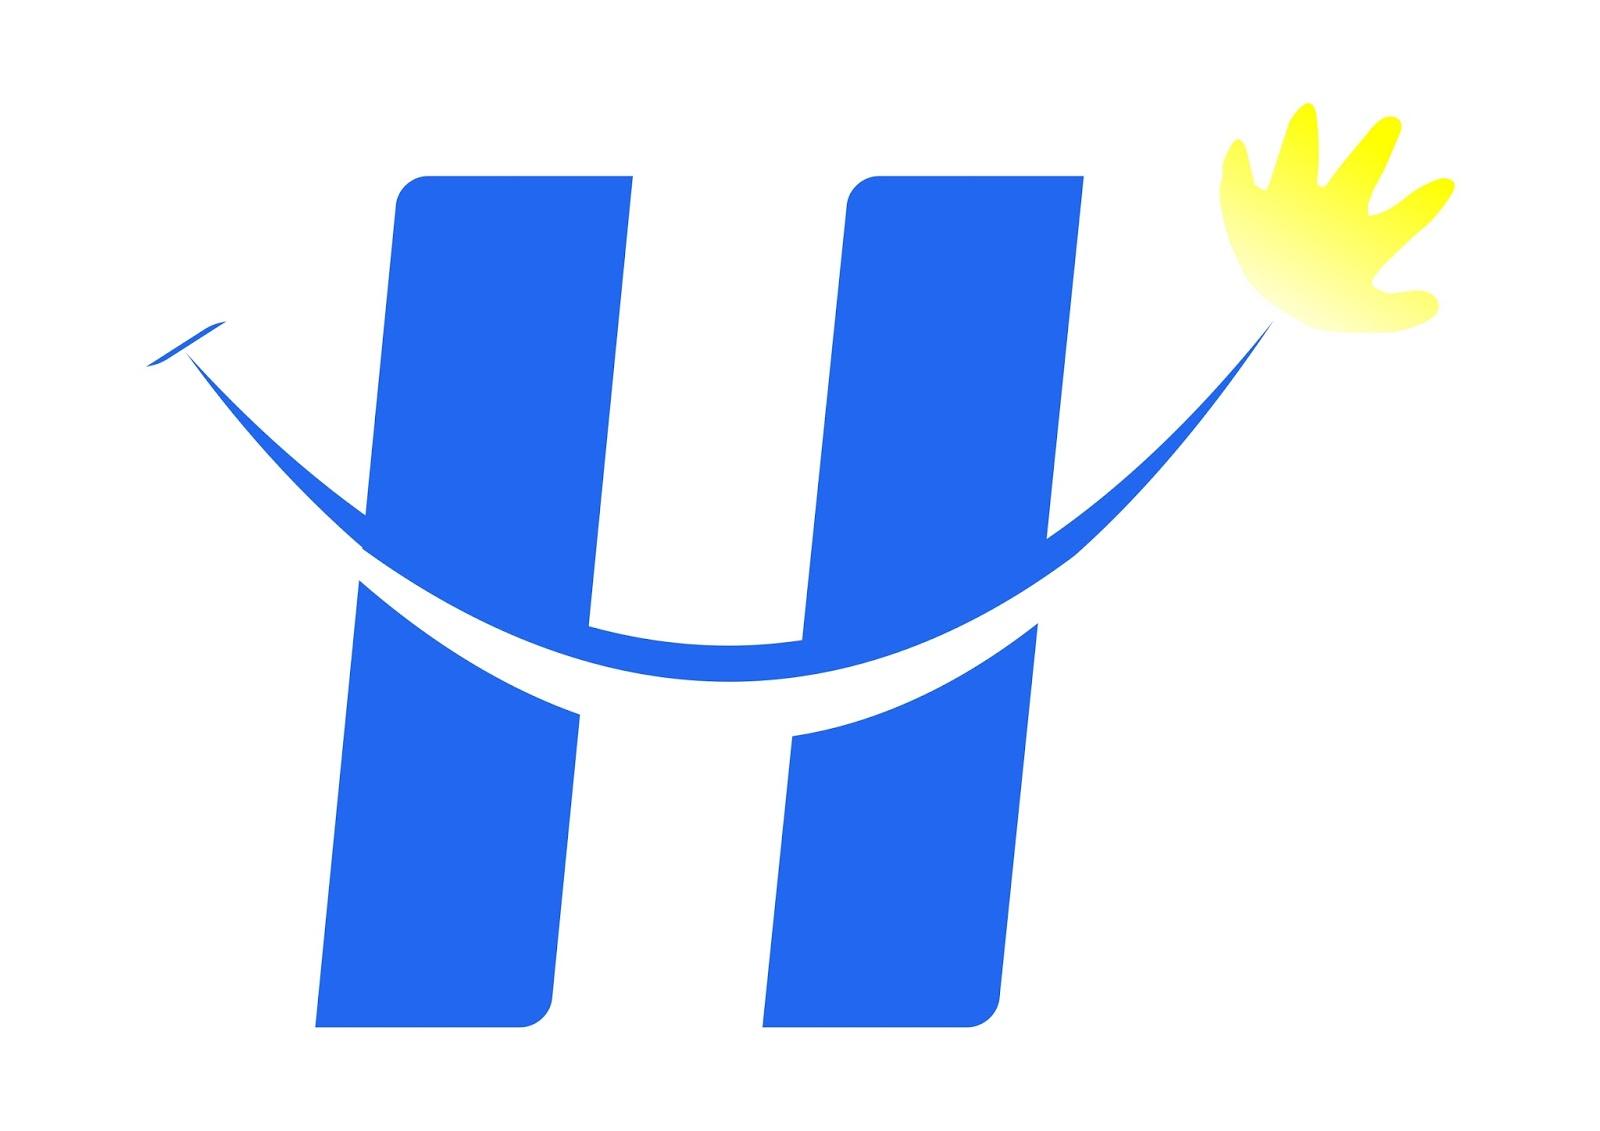 logo inisial 12 ips 1 sman 1 ultra